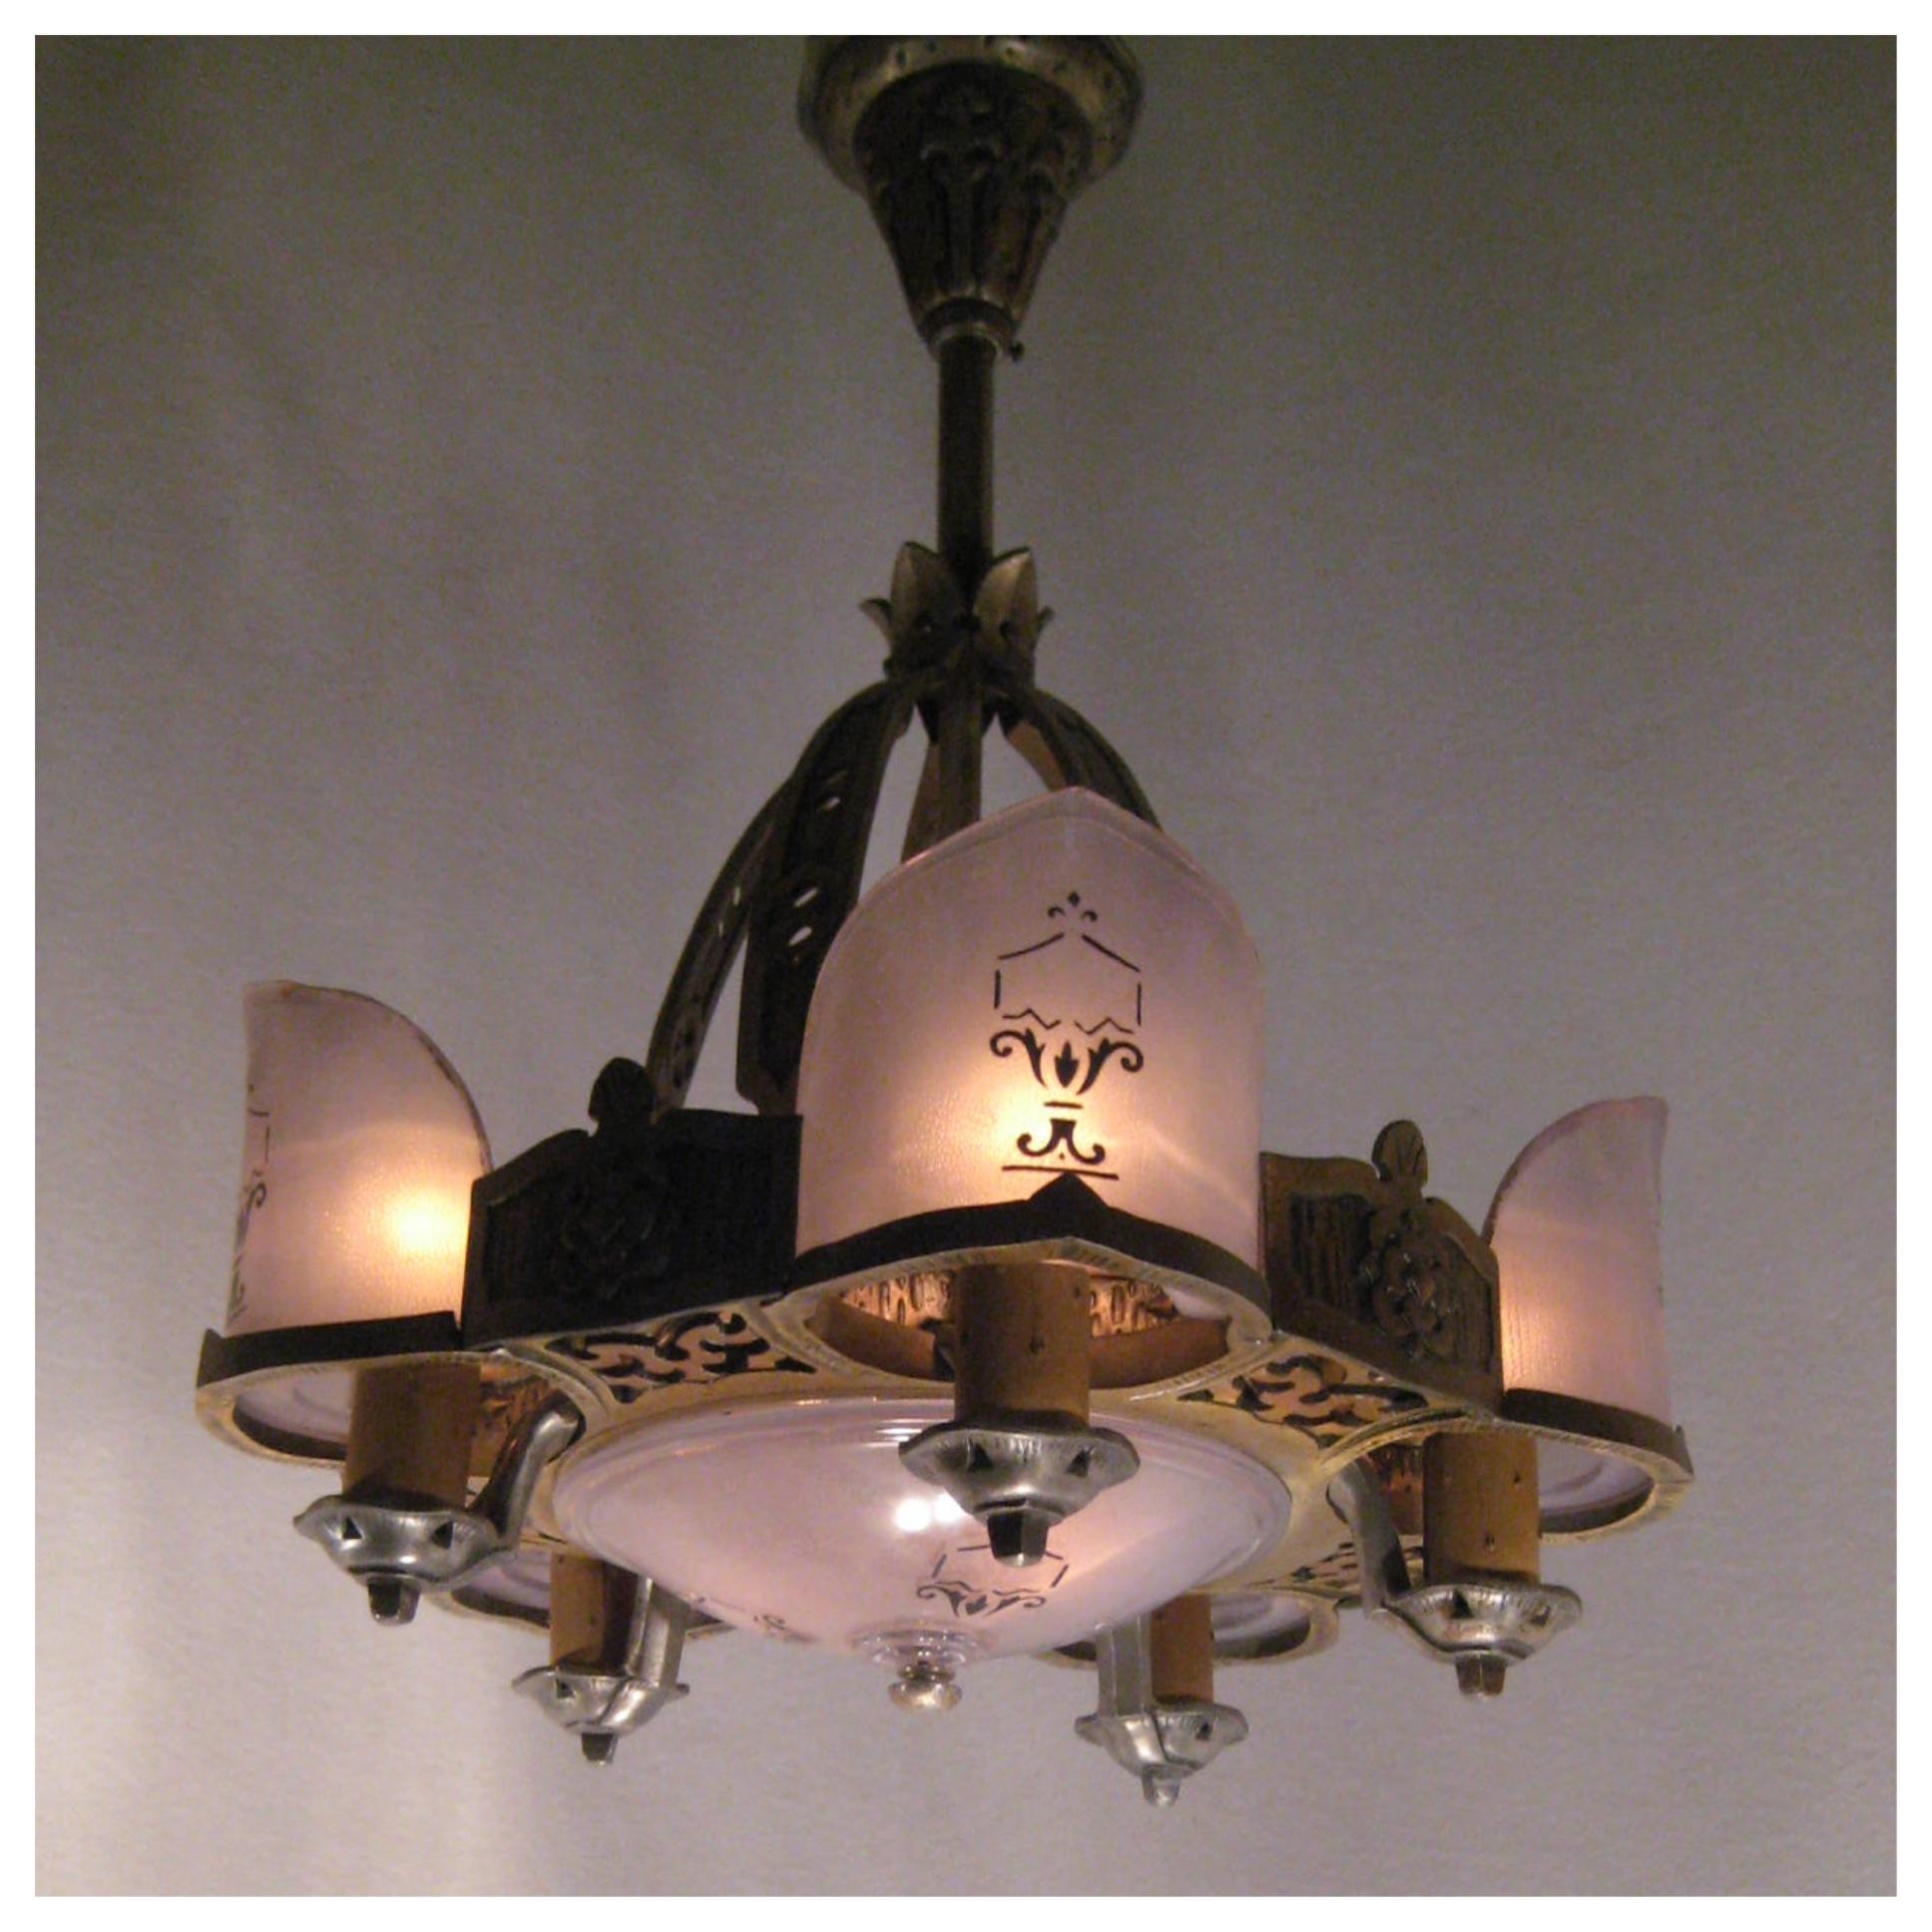 A3546 tudor style art deco chandelier bogart bremmer bradley a3546 tudor style art deco chandelier arubaitofo Gallery